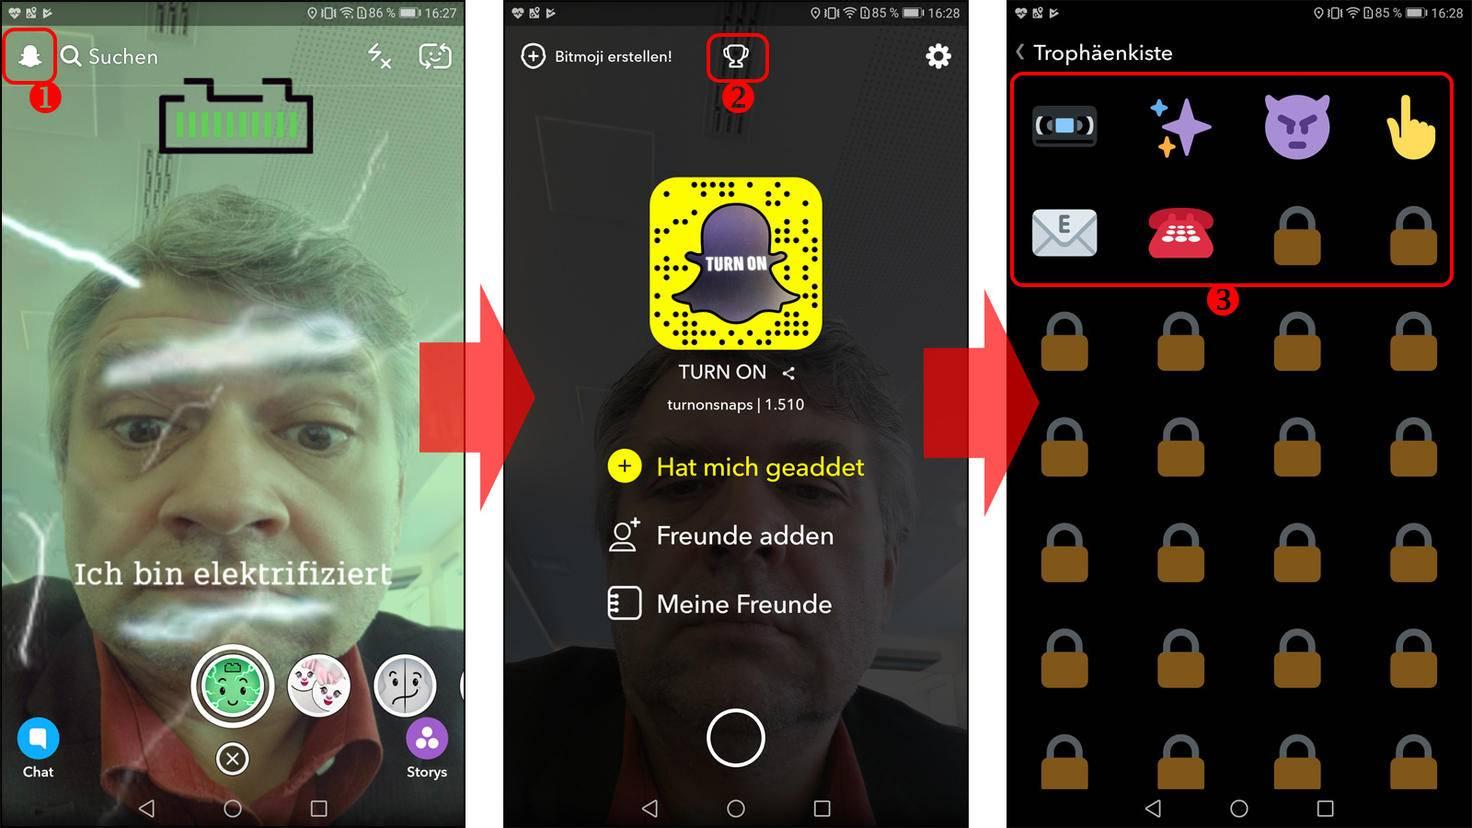 Snapchat Trophäen